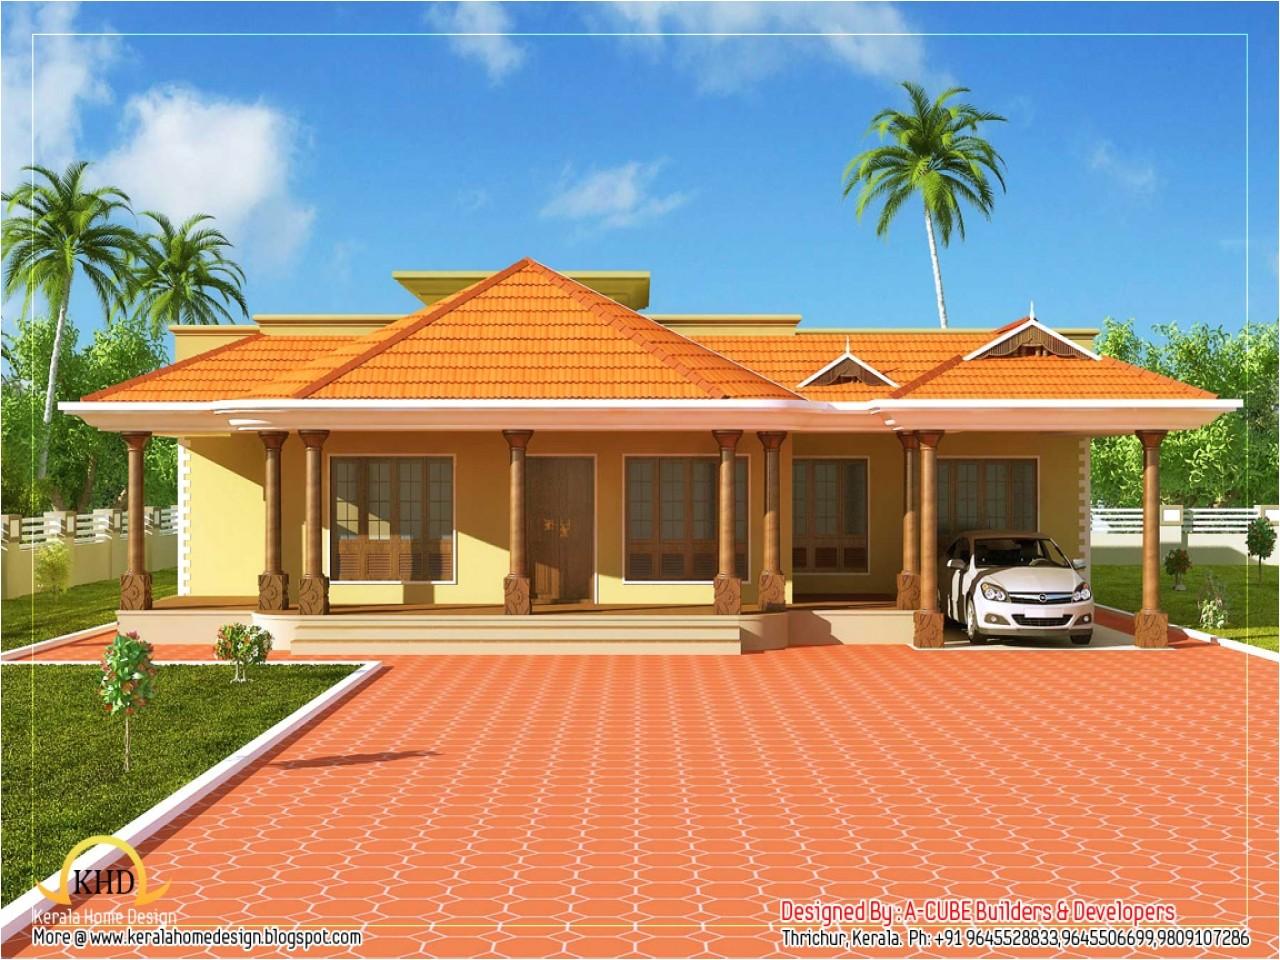 1302c3c7710d8c97 kerala single floor home design single floor house plans